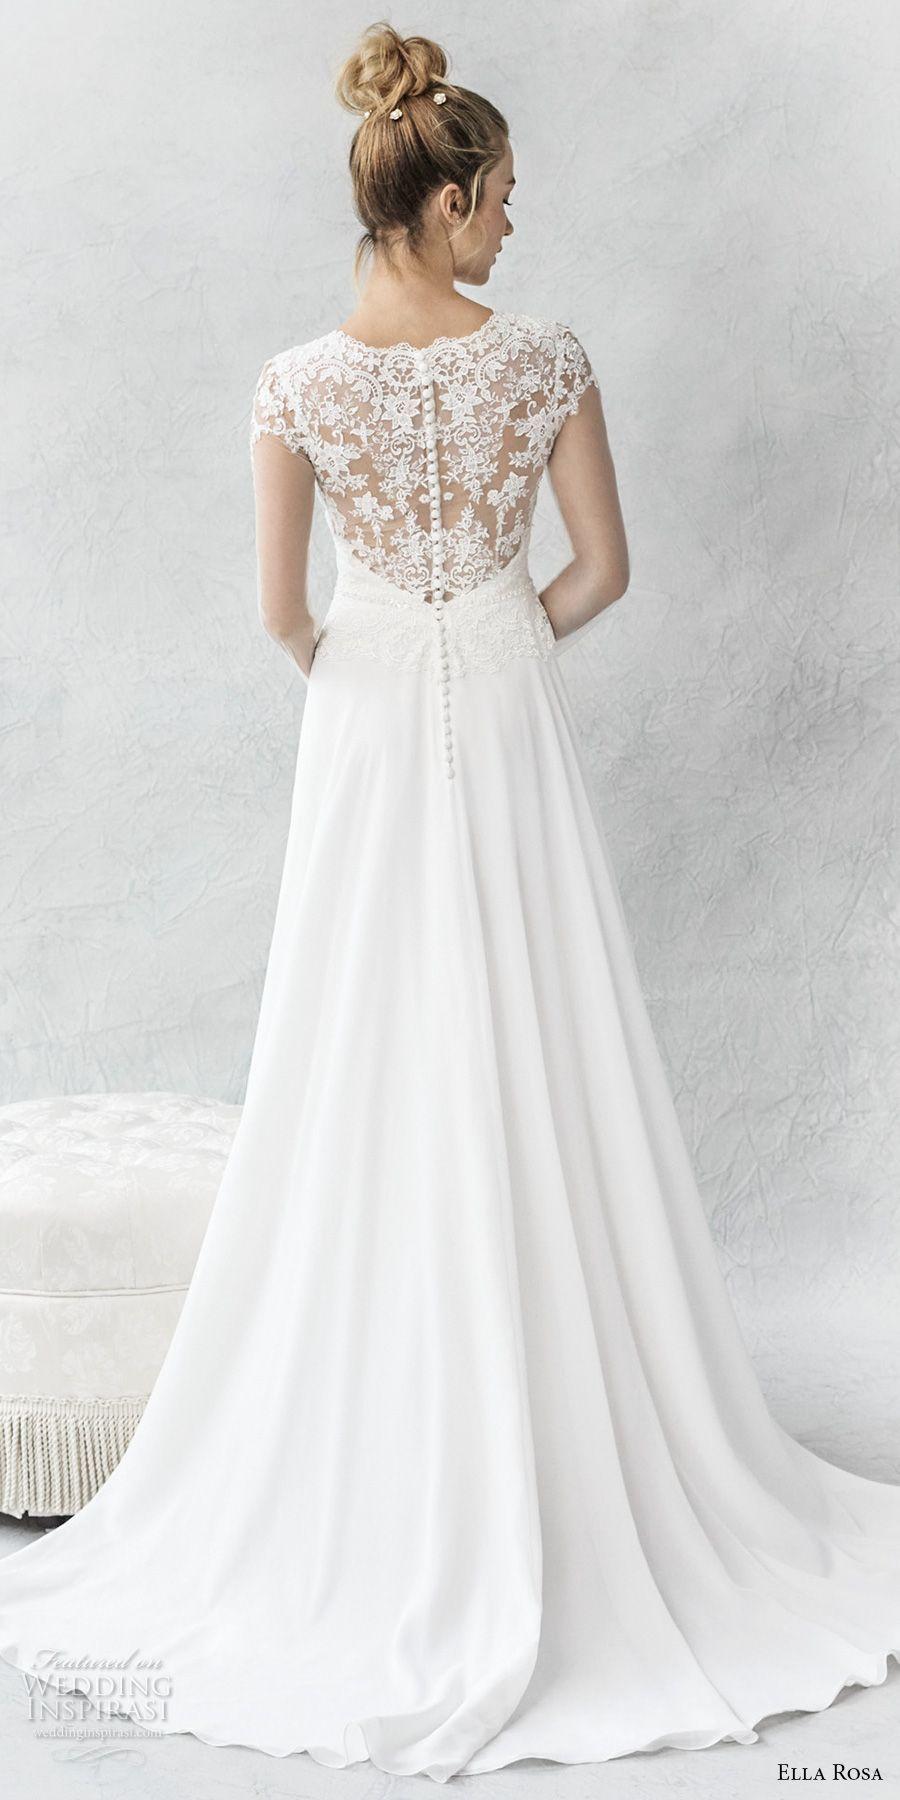 Ella rosa spring bridal long sleeves illusion jewel sweetheart